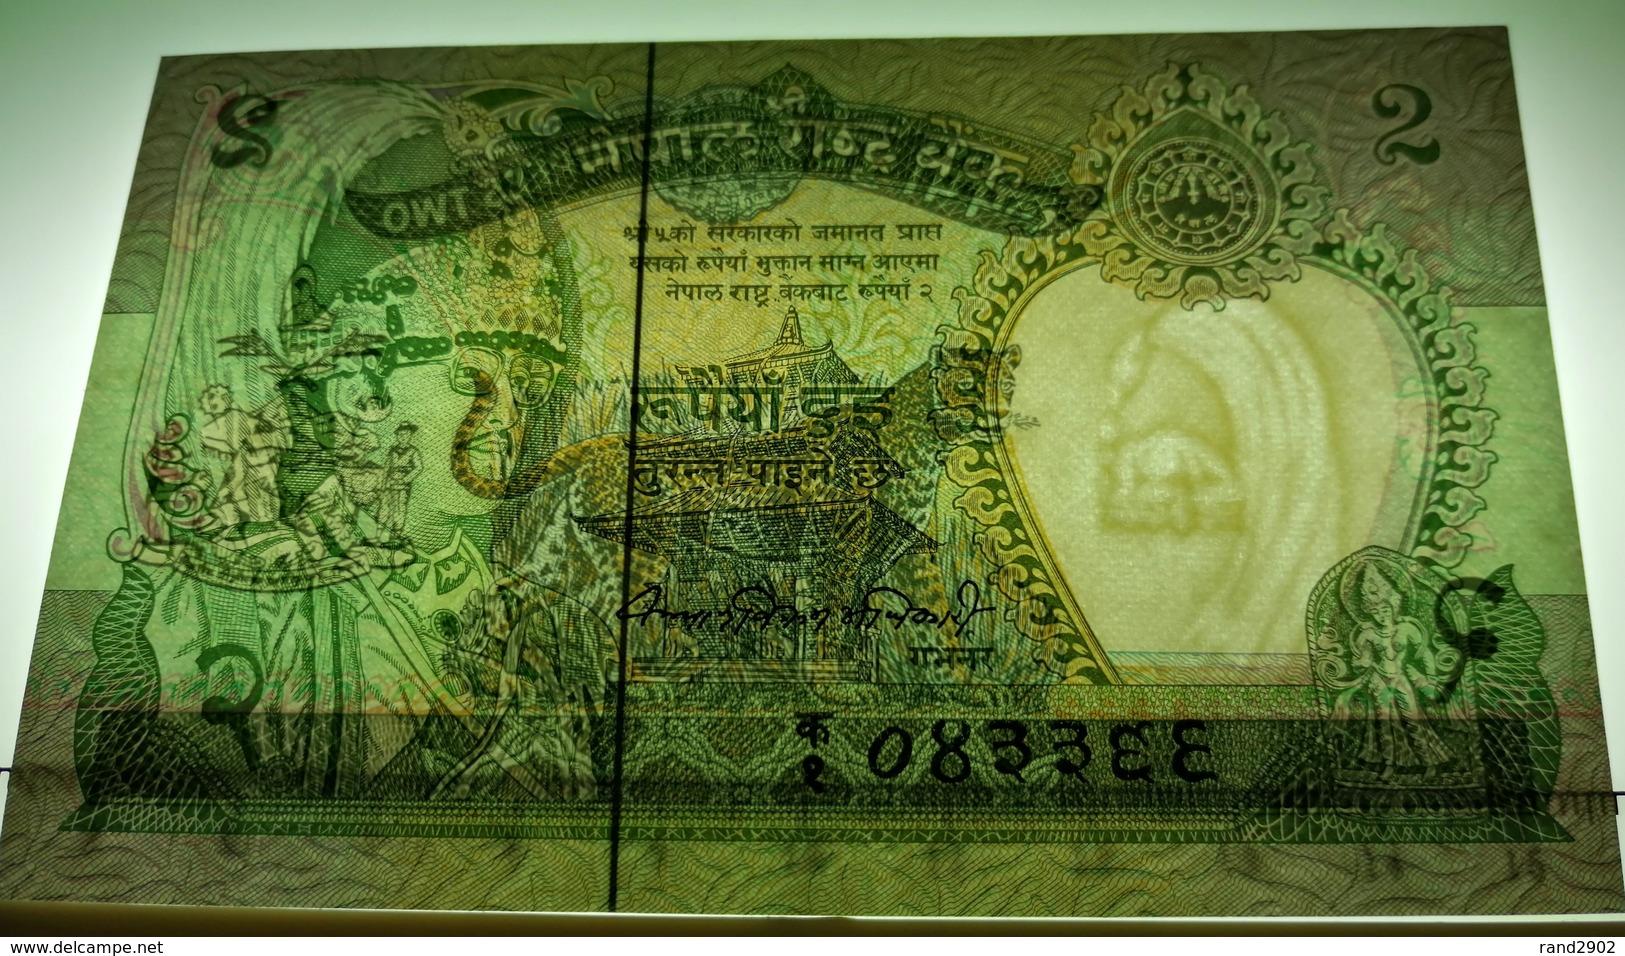 Nepal 2 Rupees 1981- (1) P-29a UNC /008B/ - Nepal